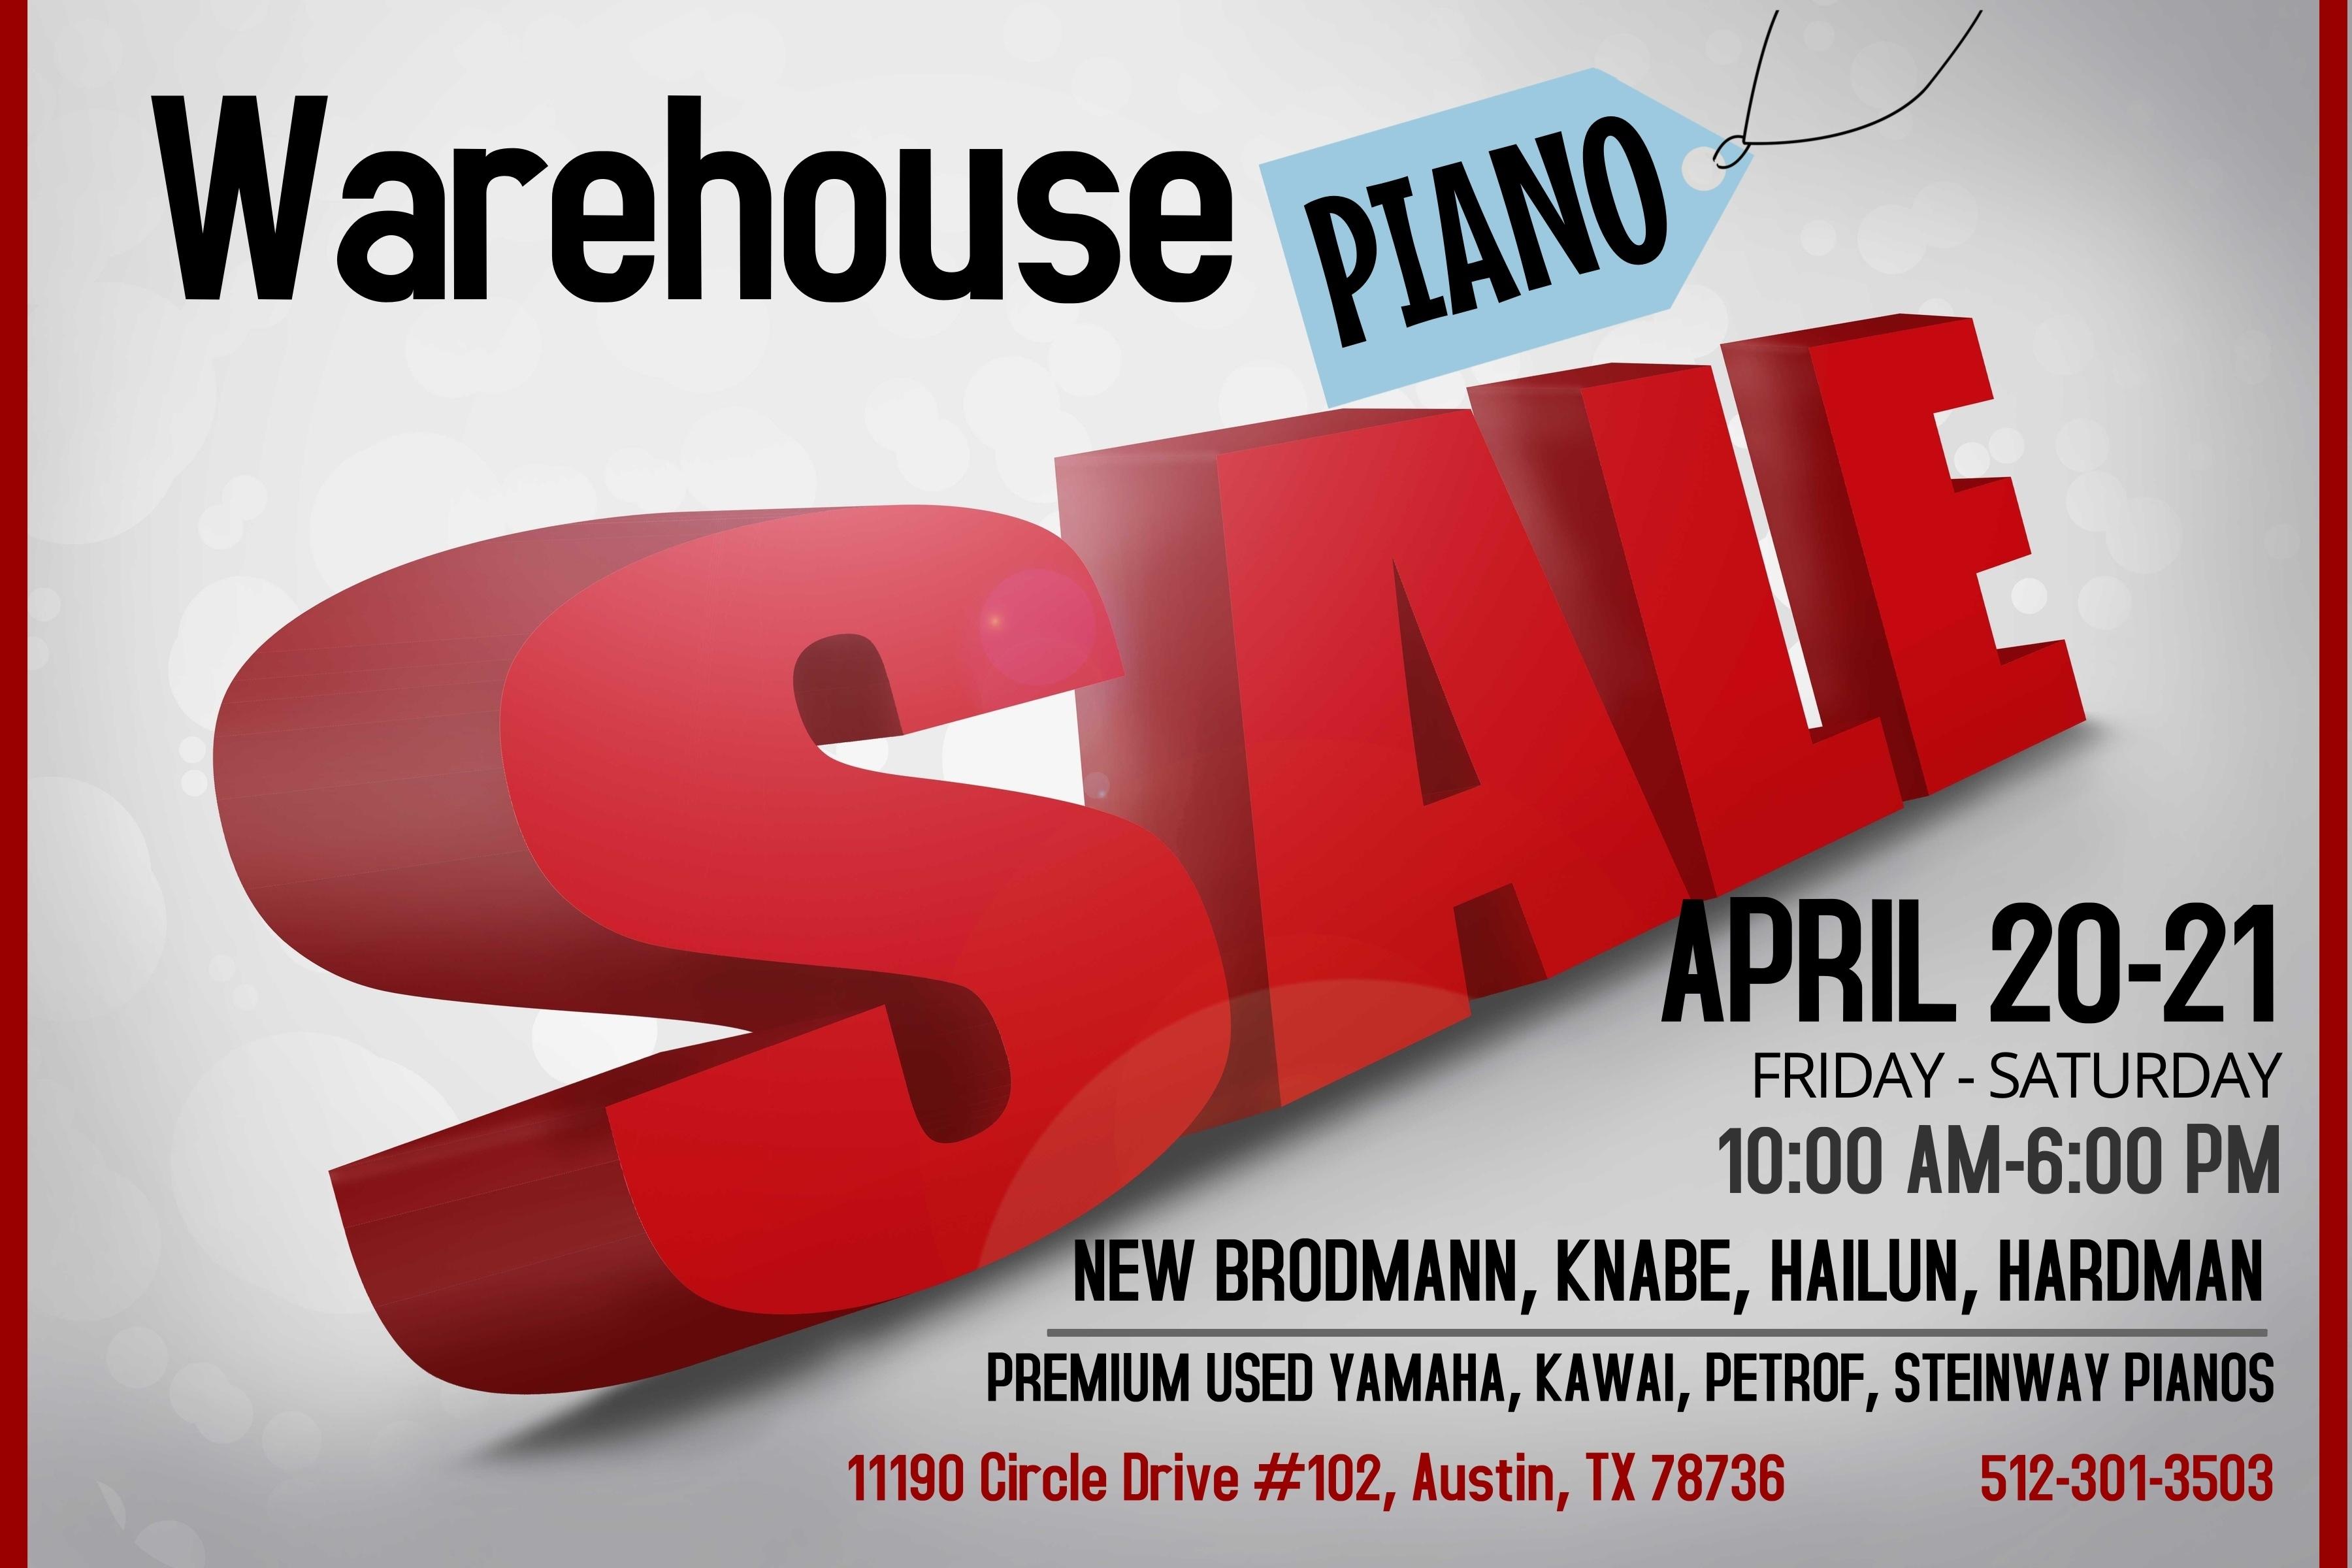 2018 Warehouse Piano Sale